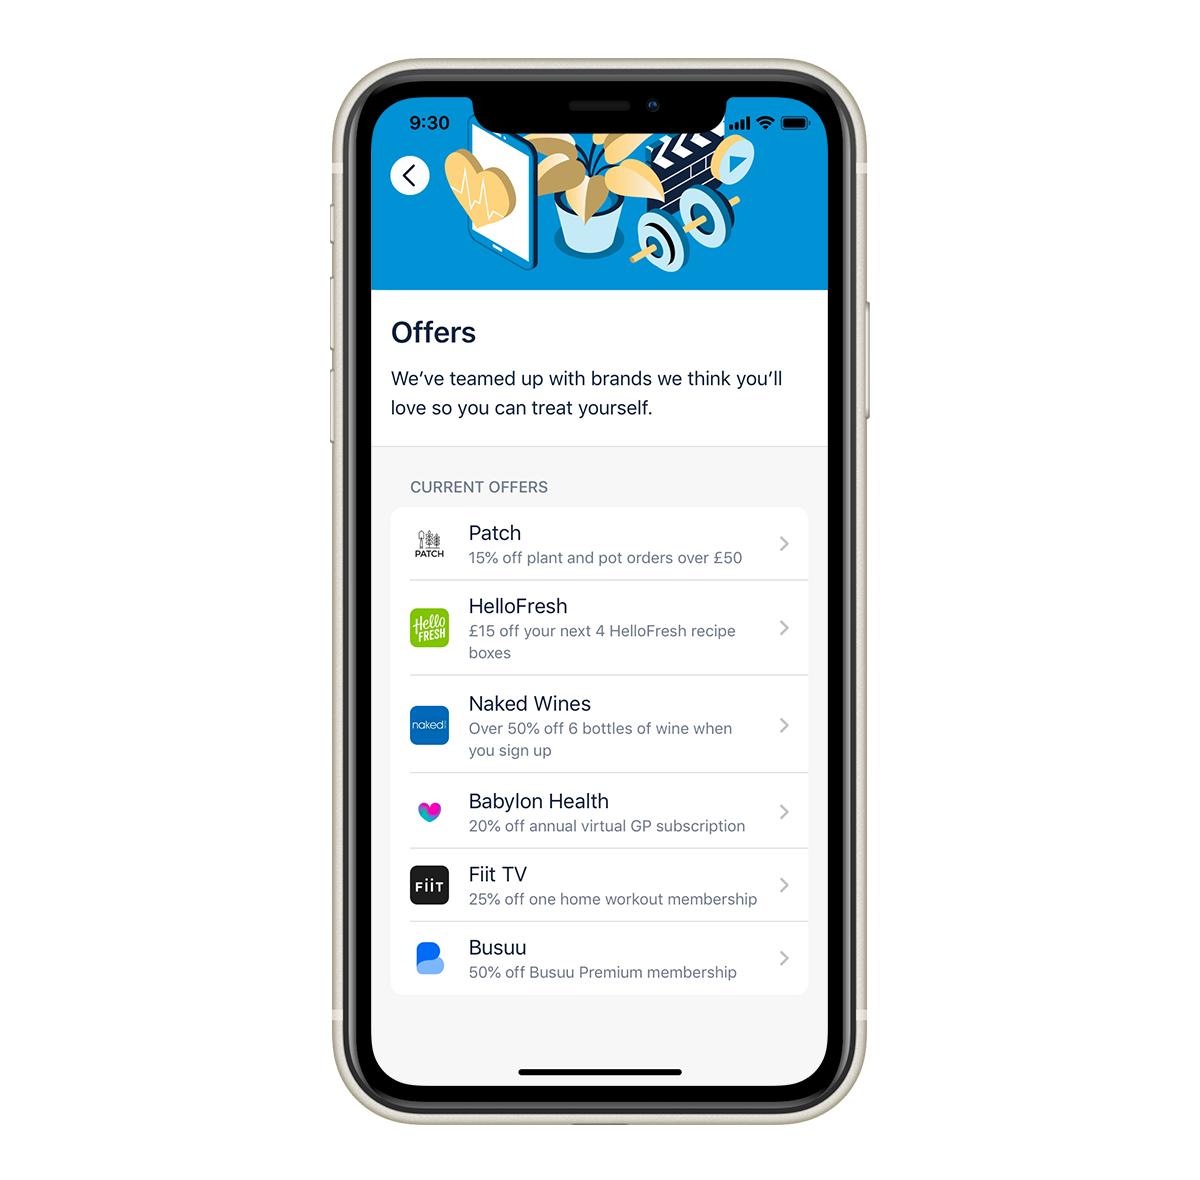 Plus Offers iOS 1